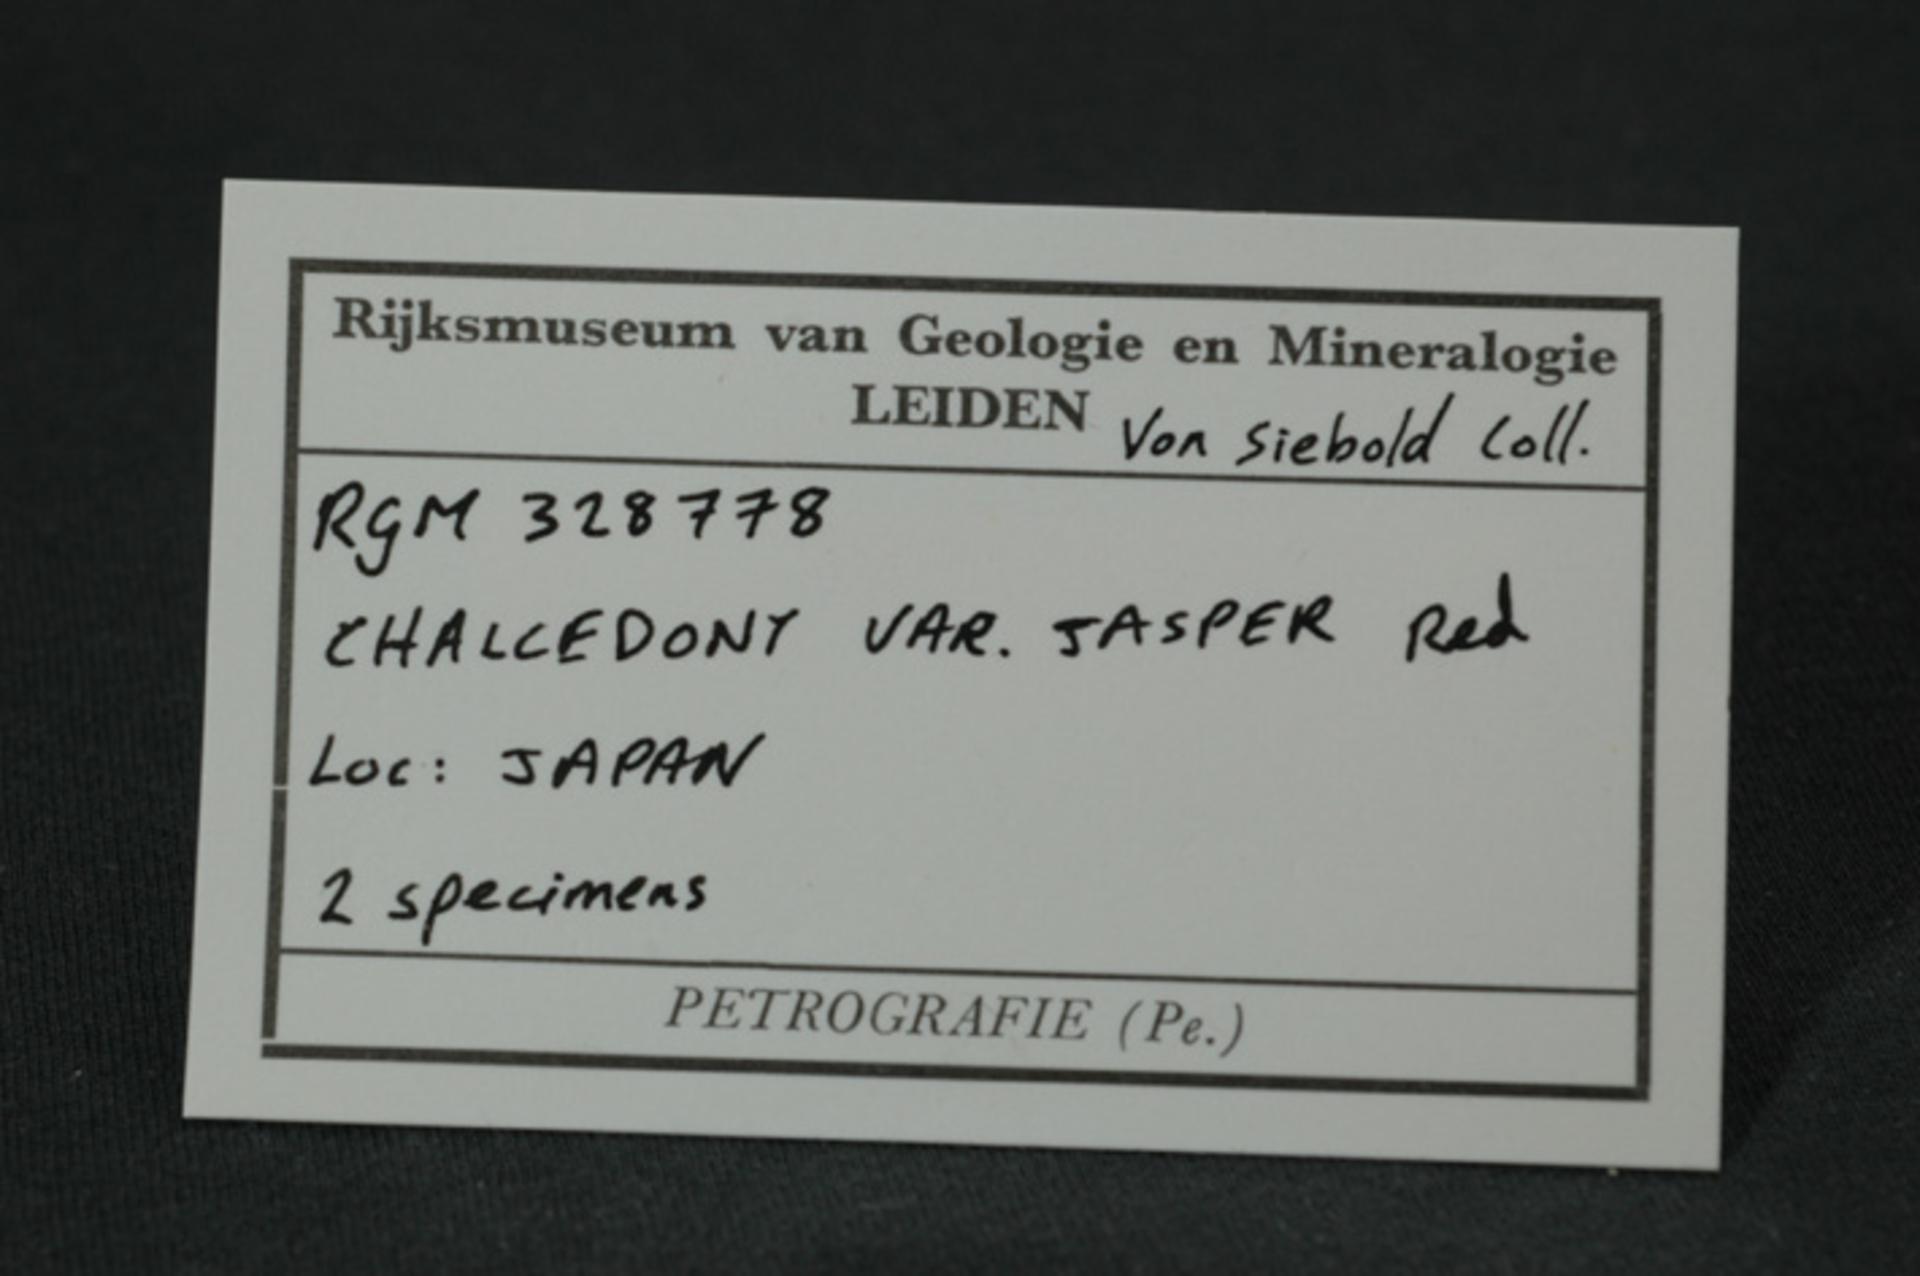 RGM.328778   CHALCEDONY VAR. JASPER. RED